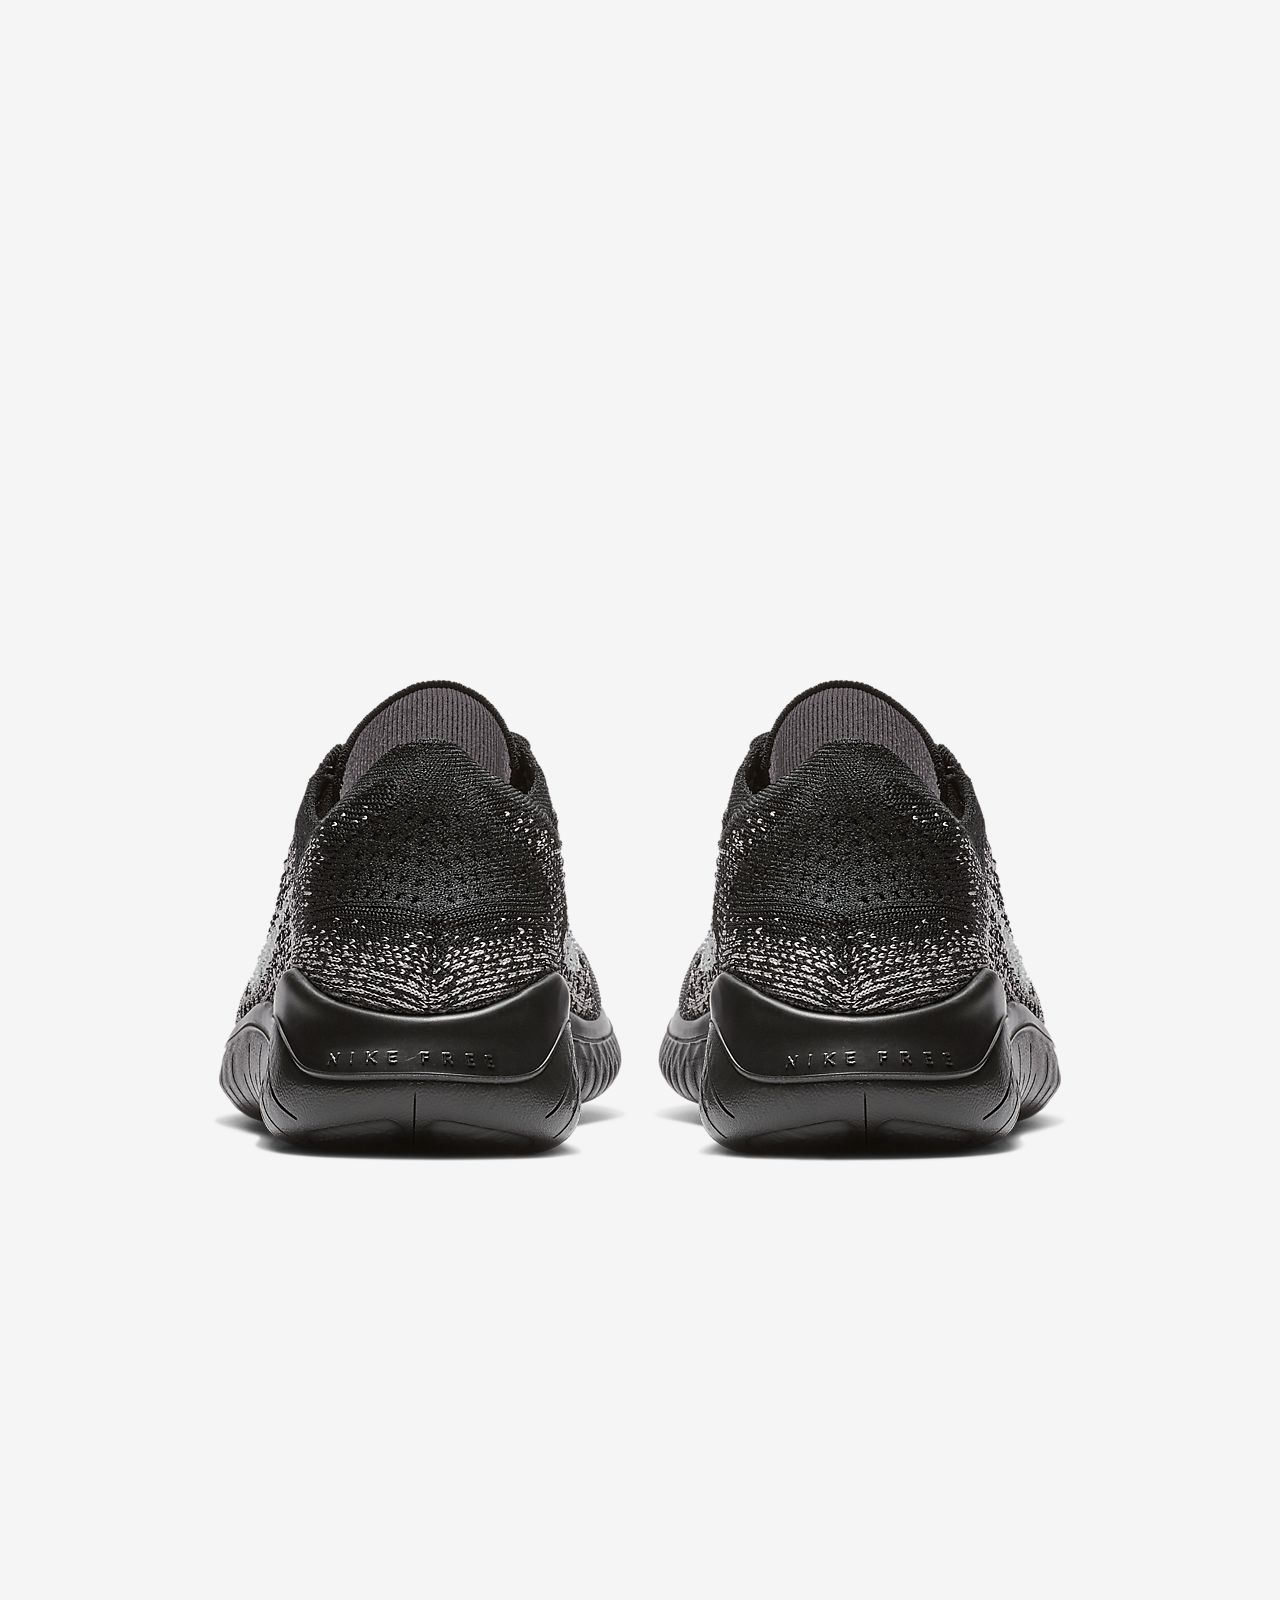 6d281d160ad3b Nike Free RN Flyknit 2018 Women s Running Shoe. Nike.com